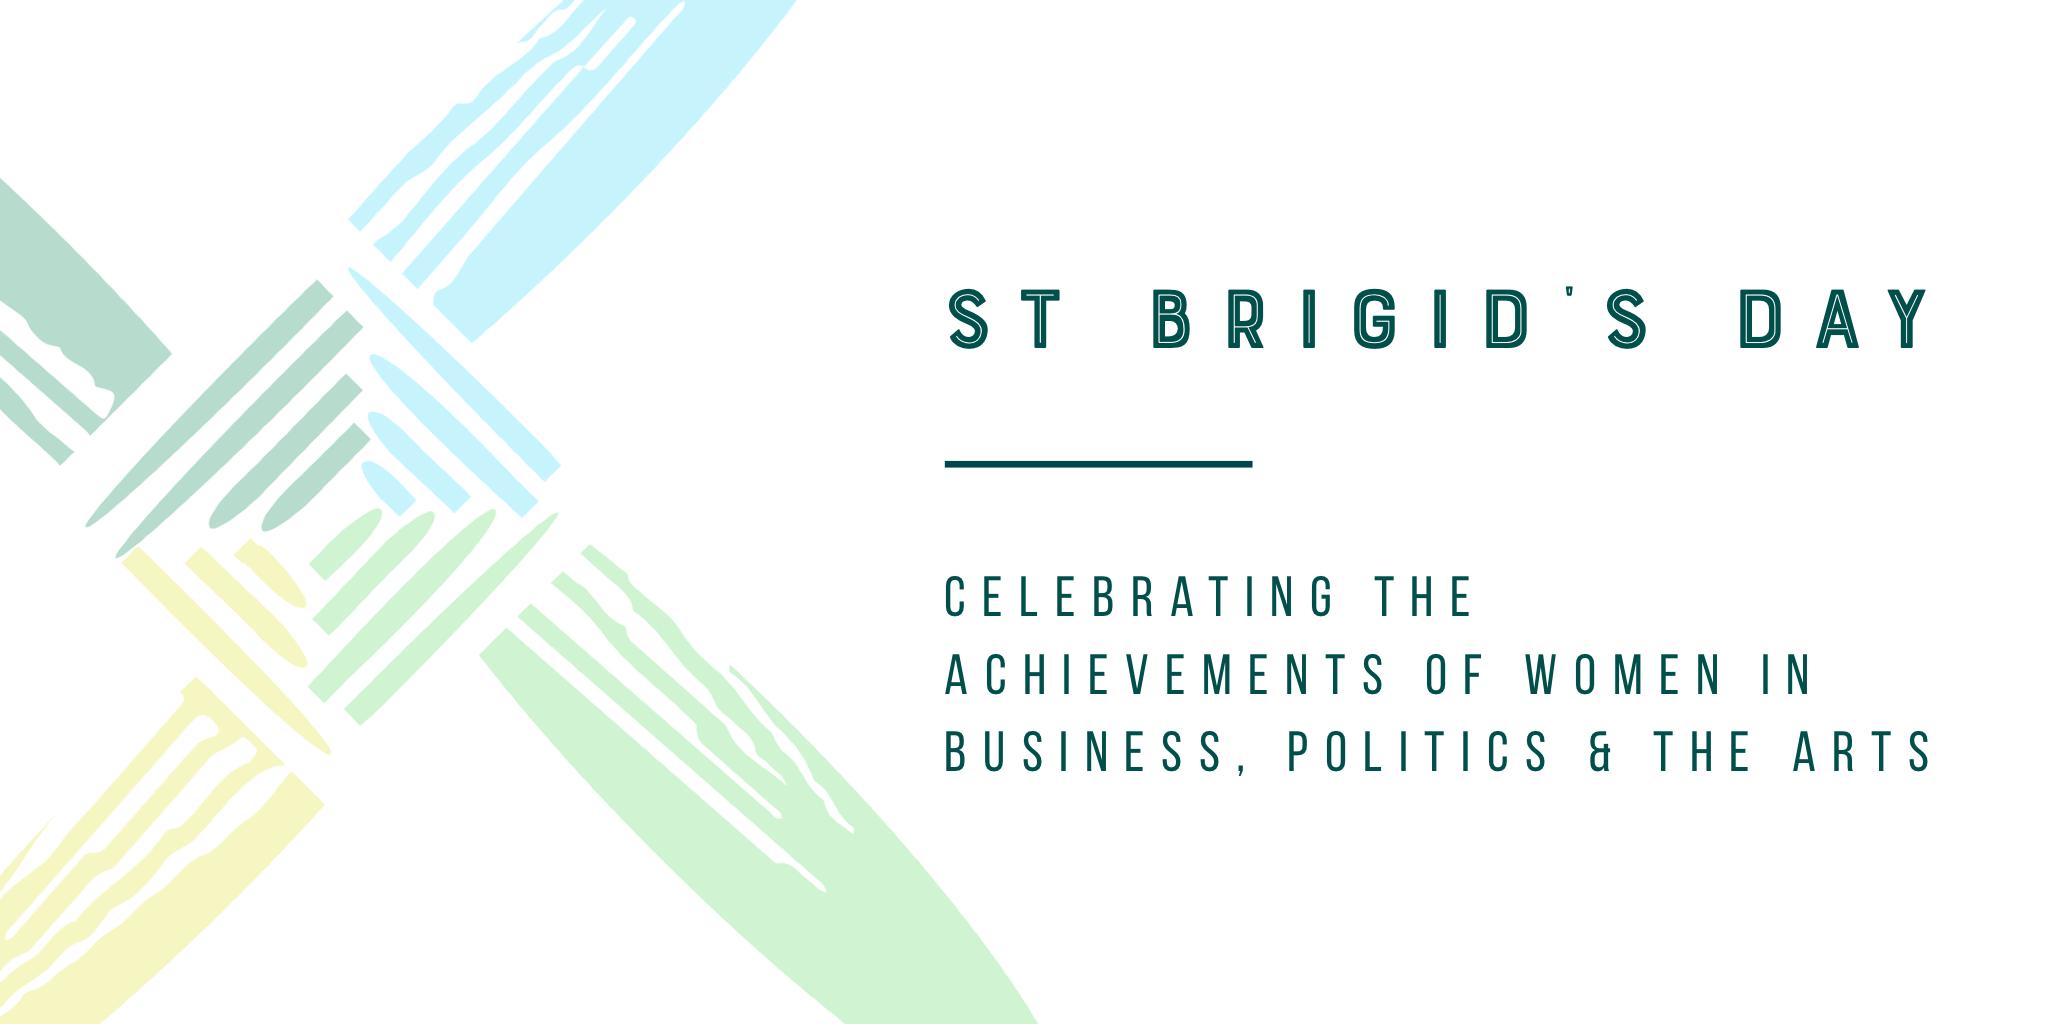 Saint Brigid's Day Event